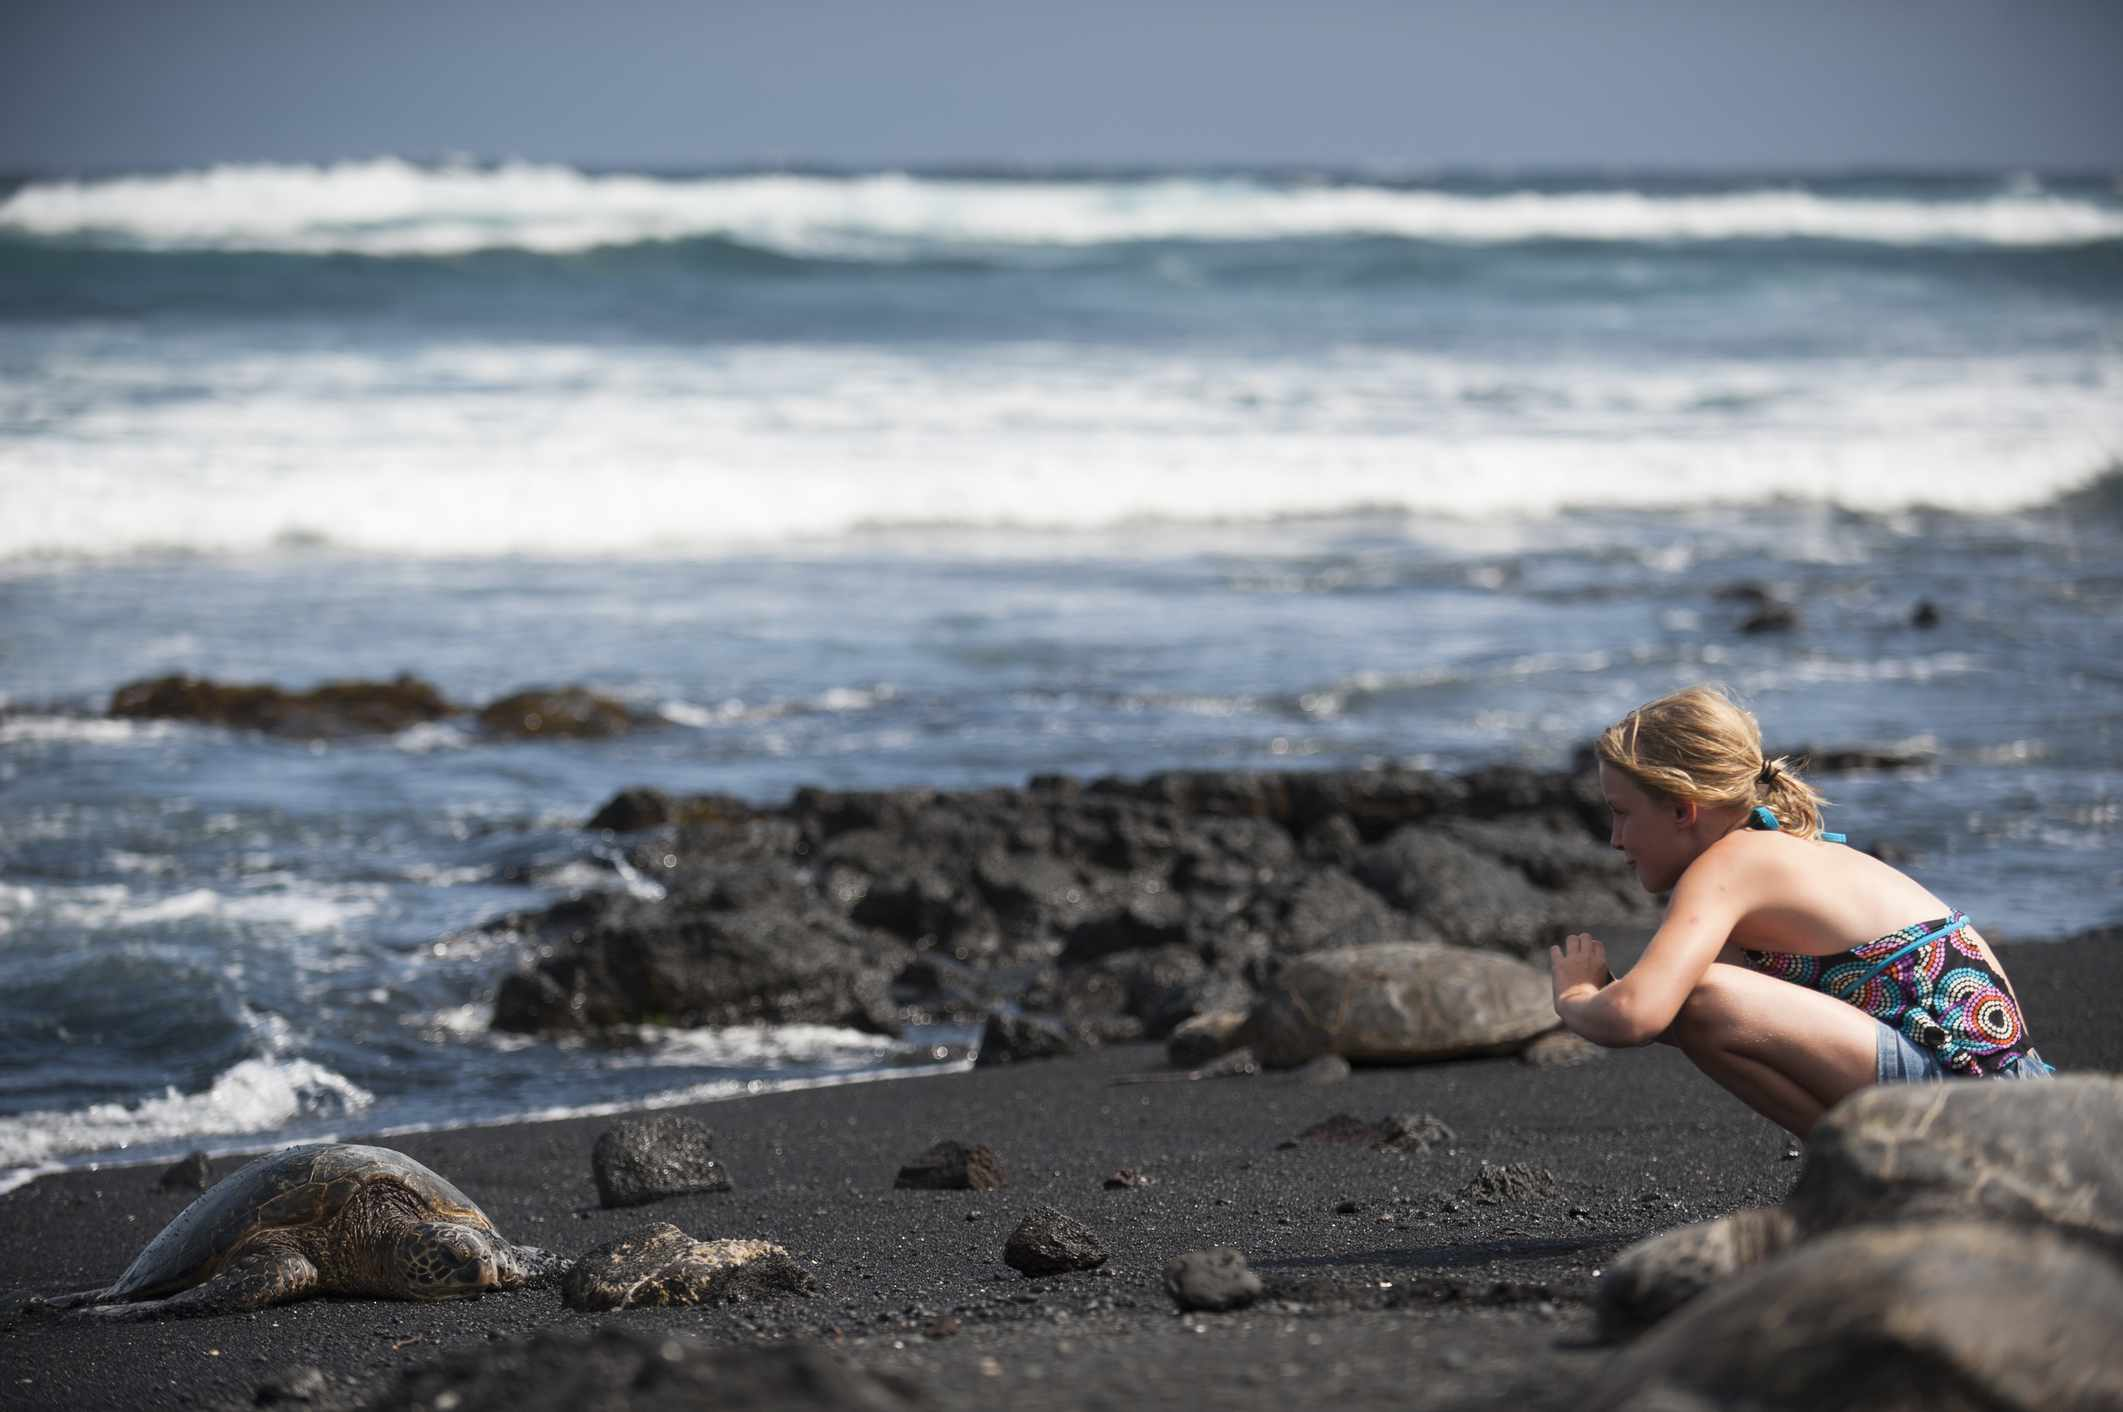 Green Sea Turtle on the Beach, Punaluu Beach Park, Kau District, Big Island of Hawaii